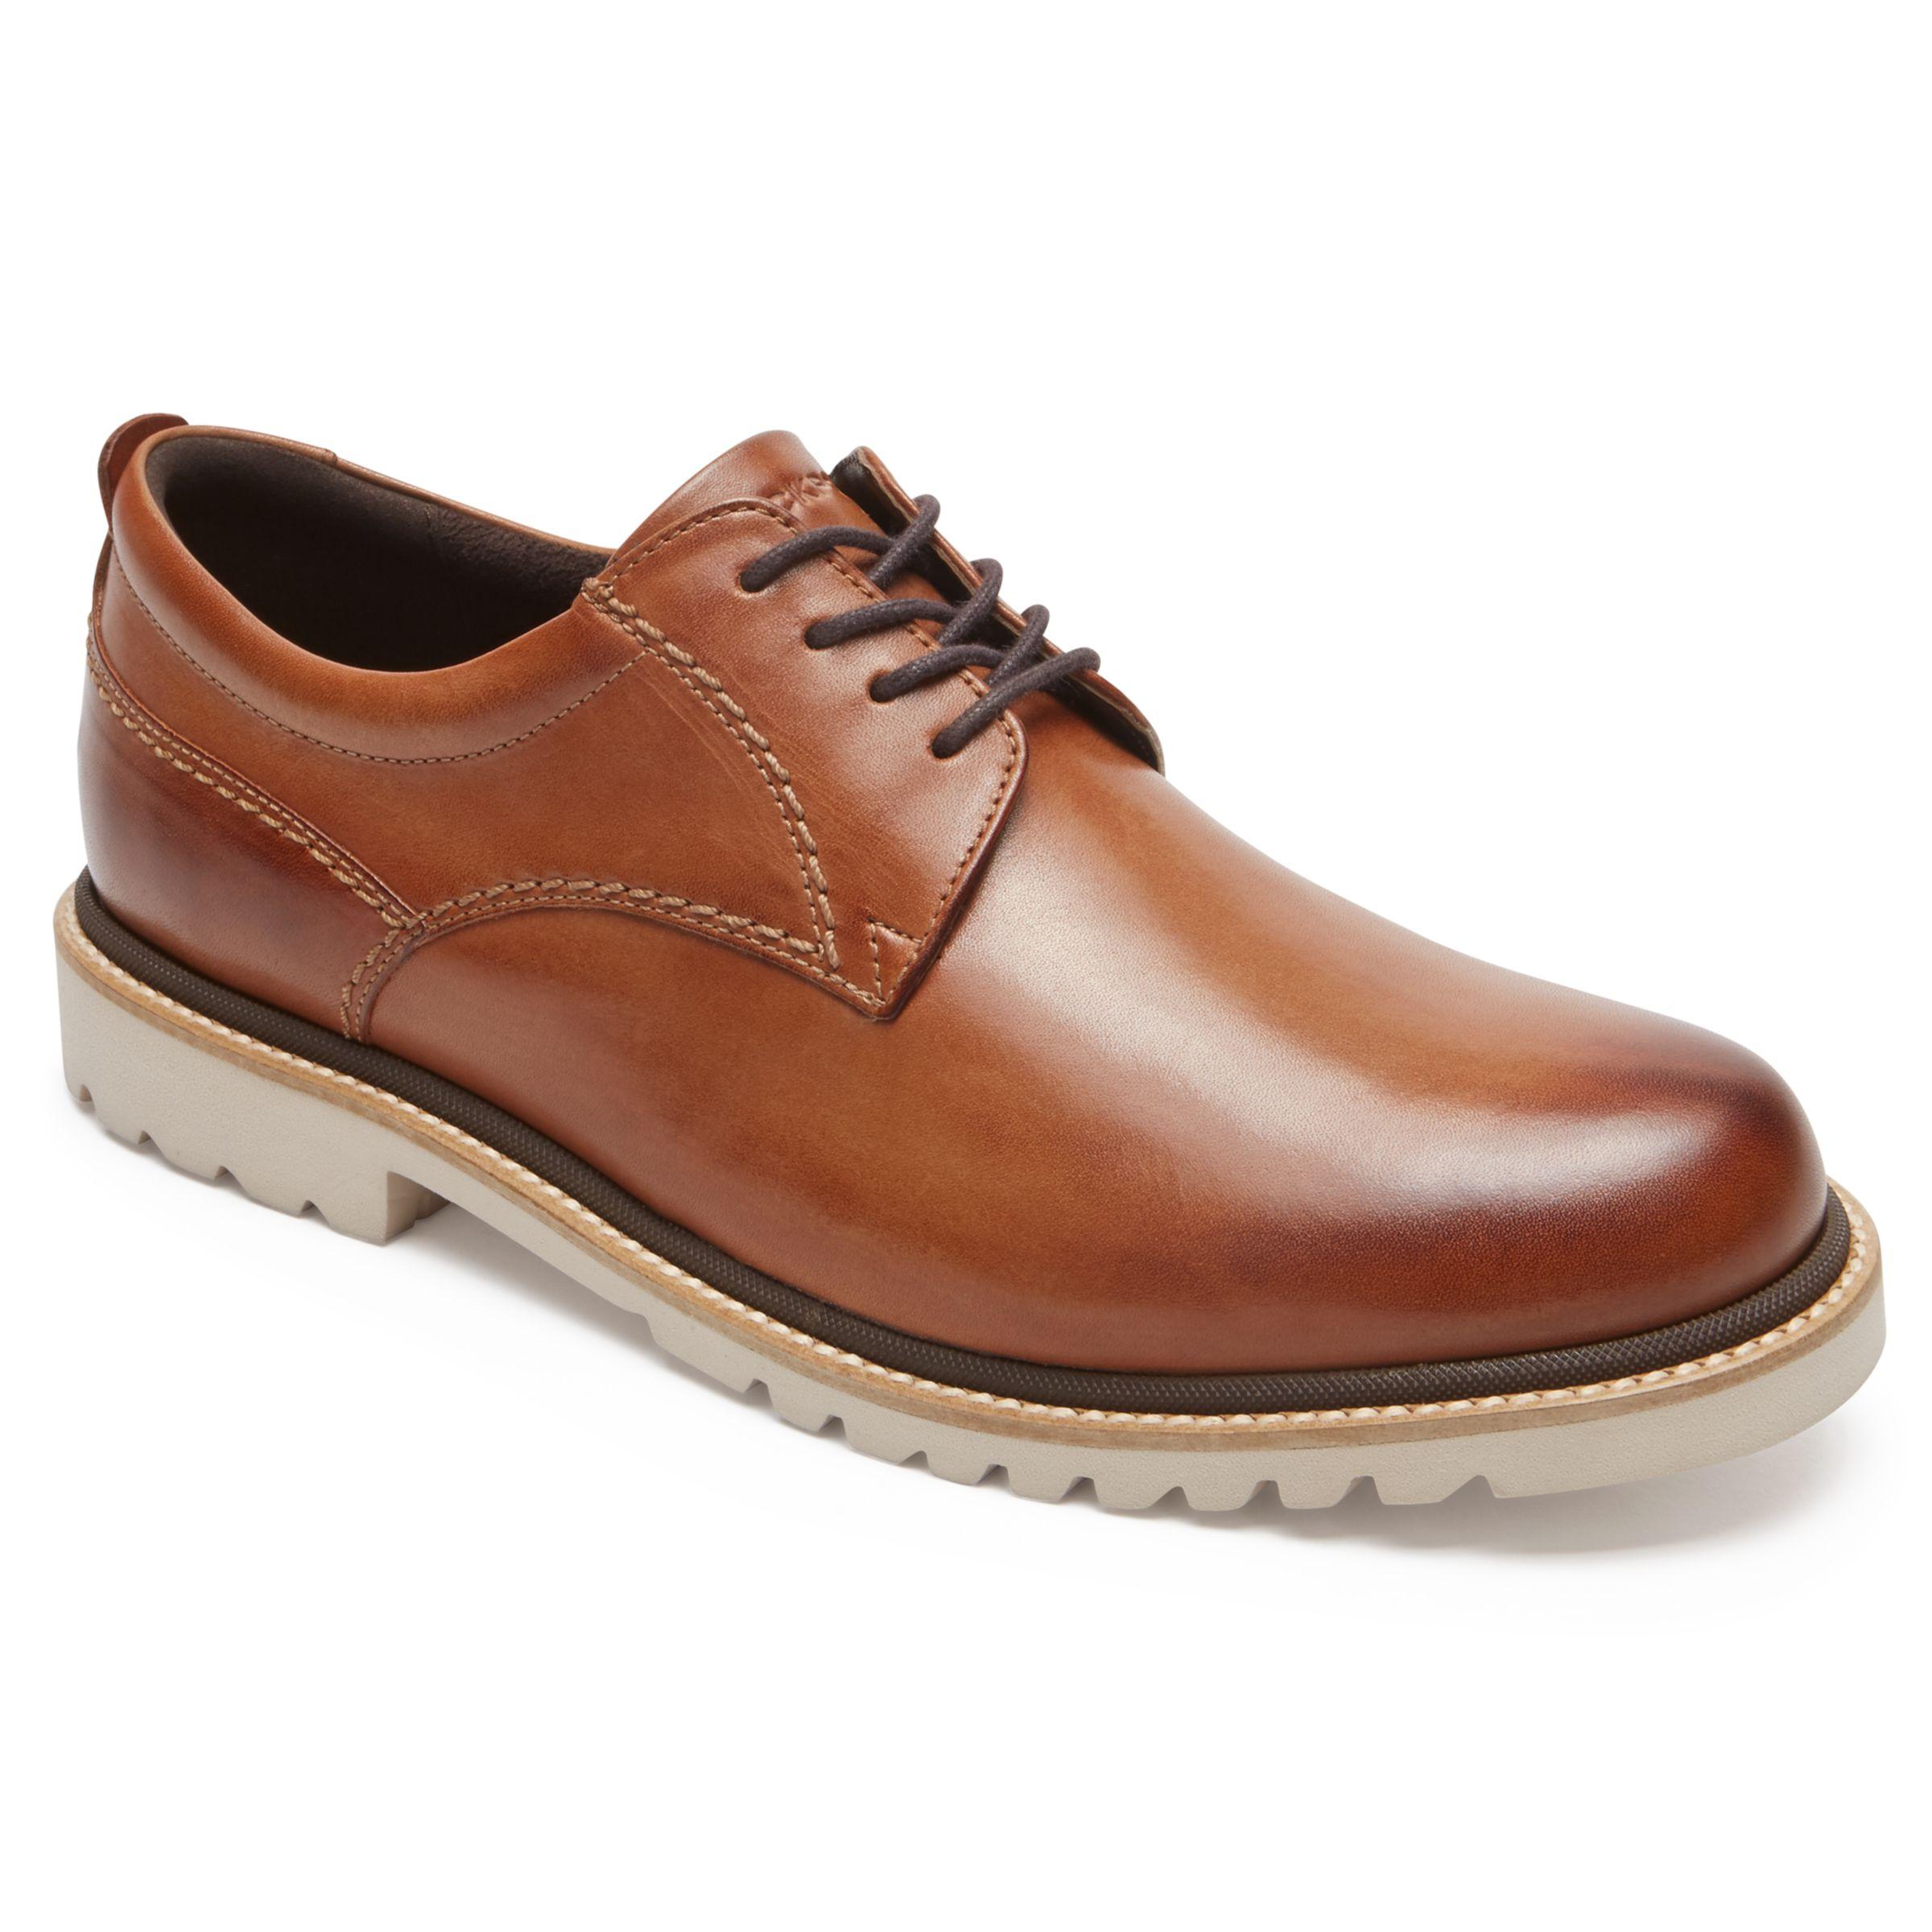 Rockport Rockport Marshal Plain Toe Derby Shoes, Cognac